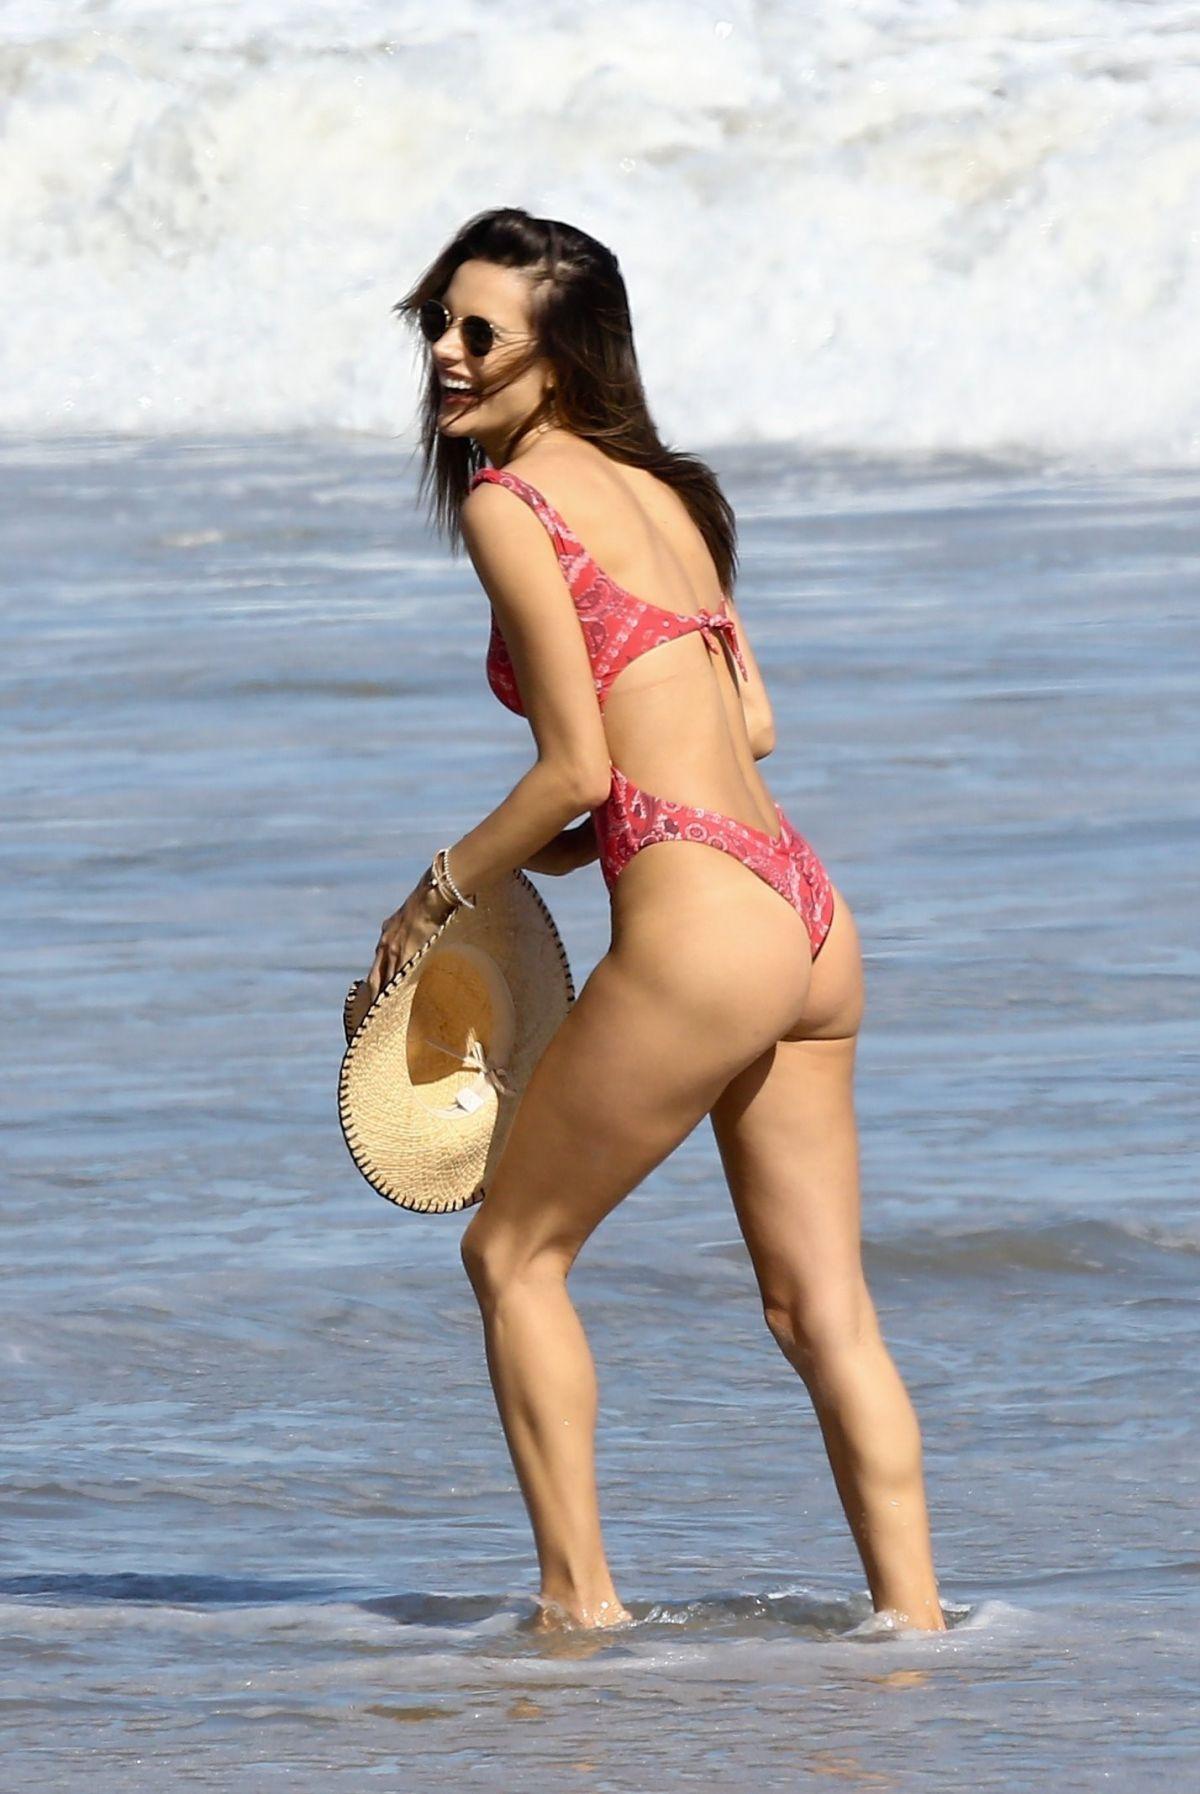 Sexy female midget models